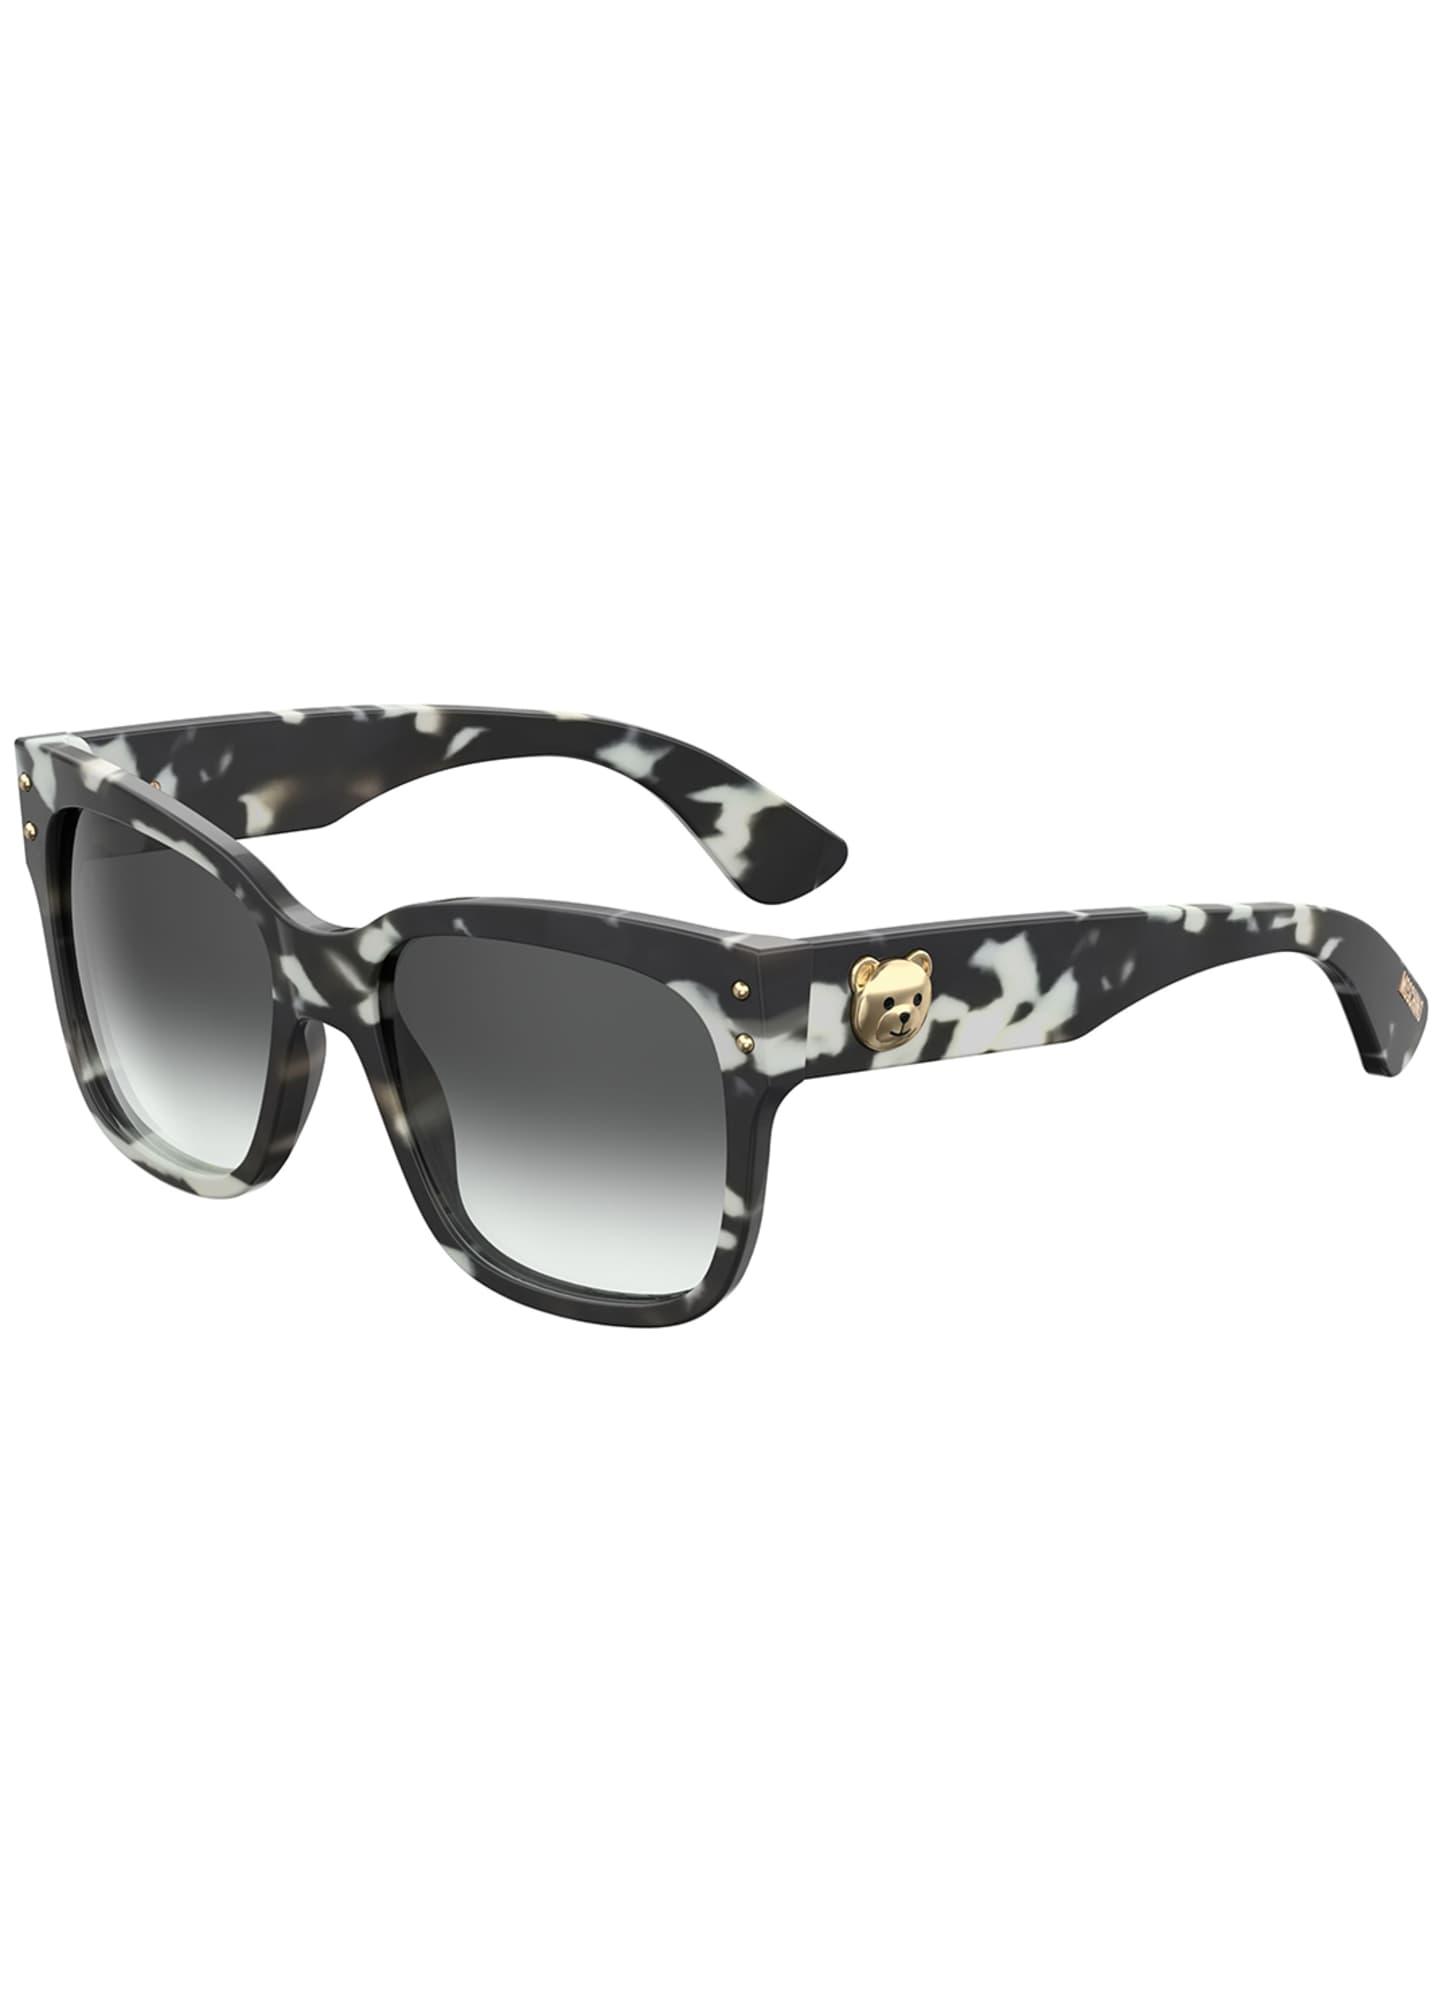 Moschino Square Gradient Sunglasses